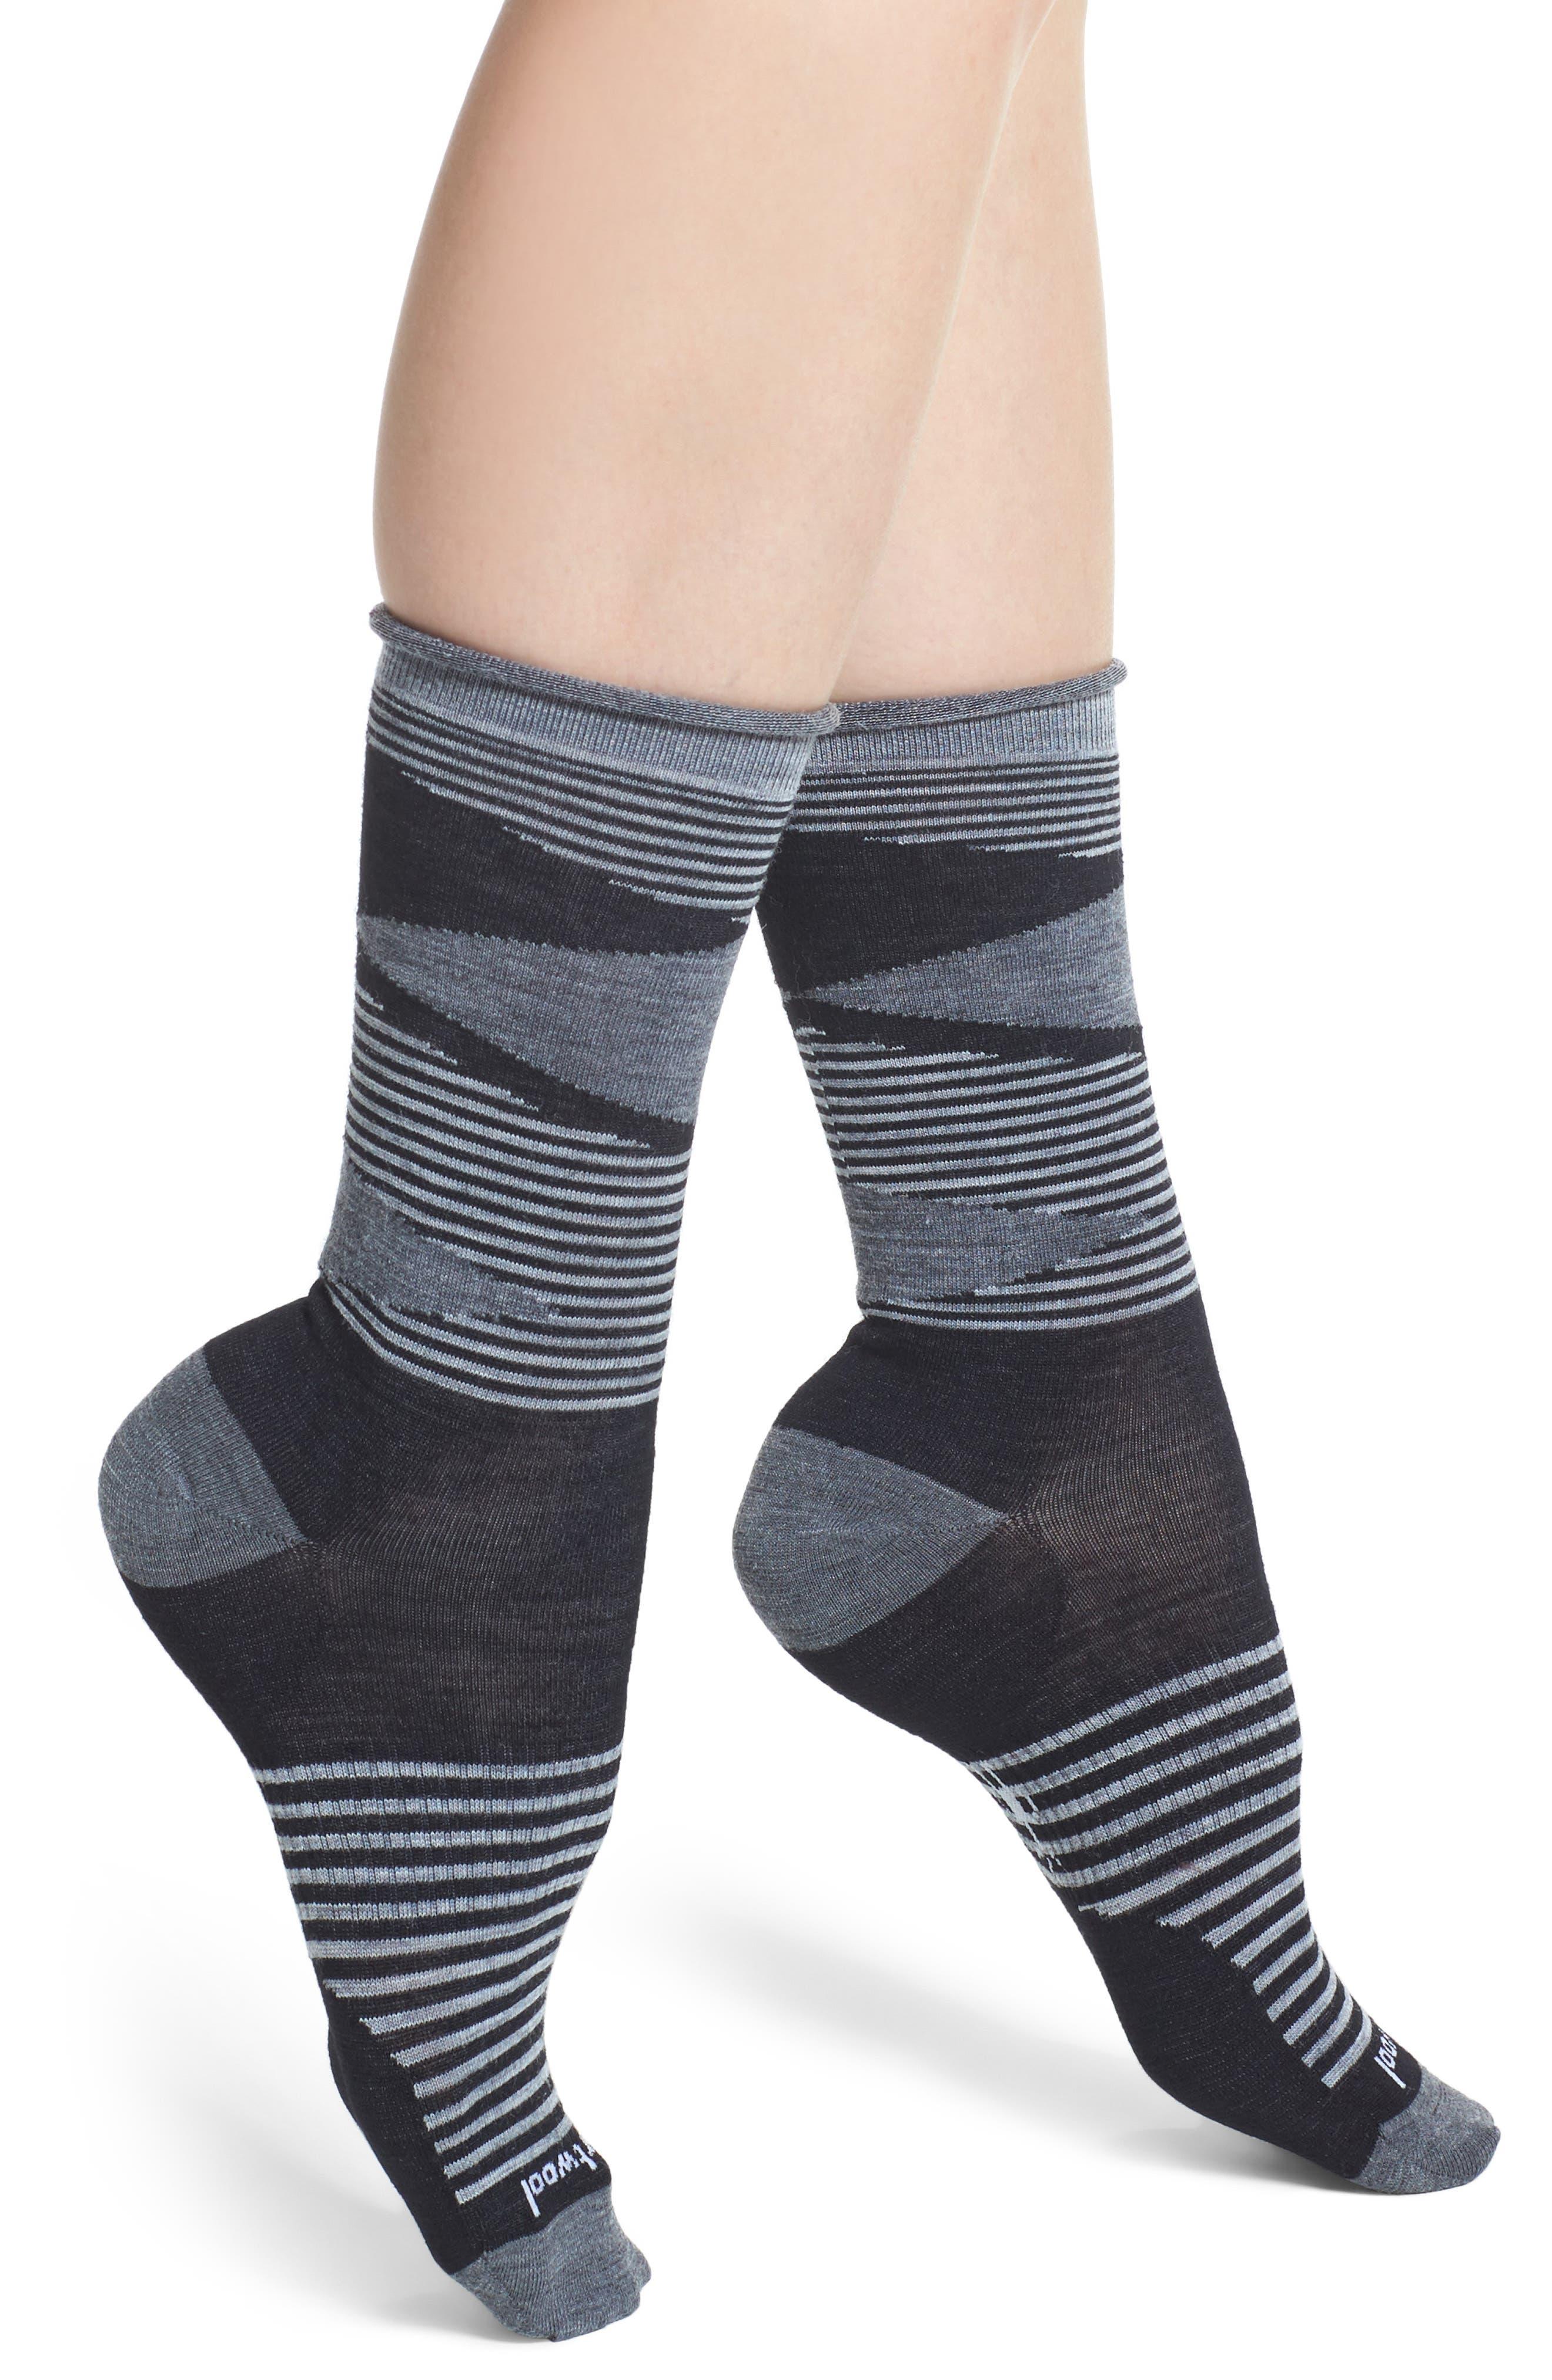 First Mate Crew Socks,                             Main thumbnail 1, color,                             Black